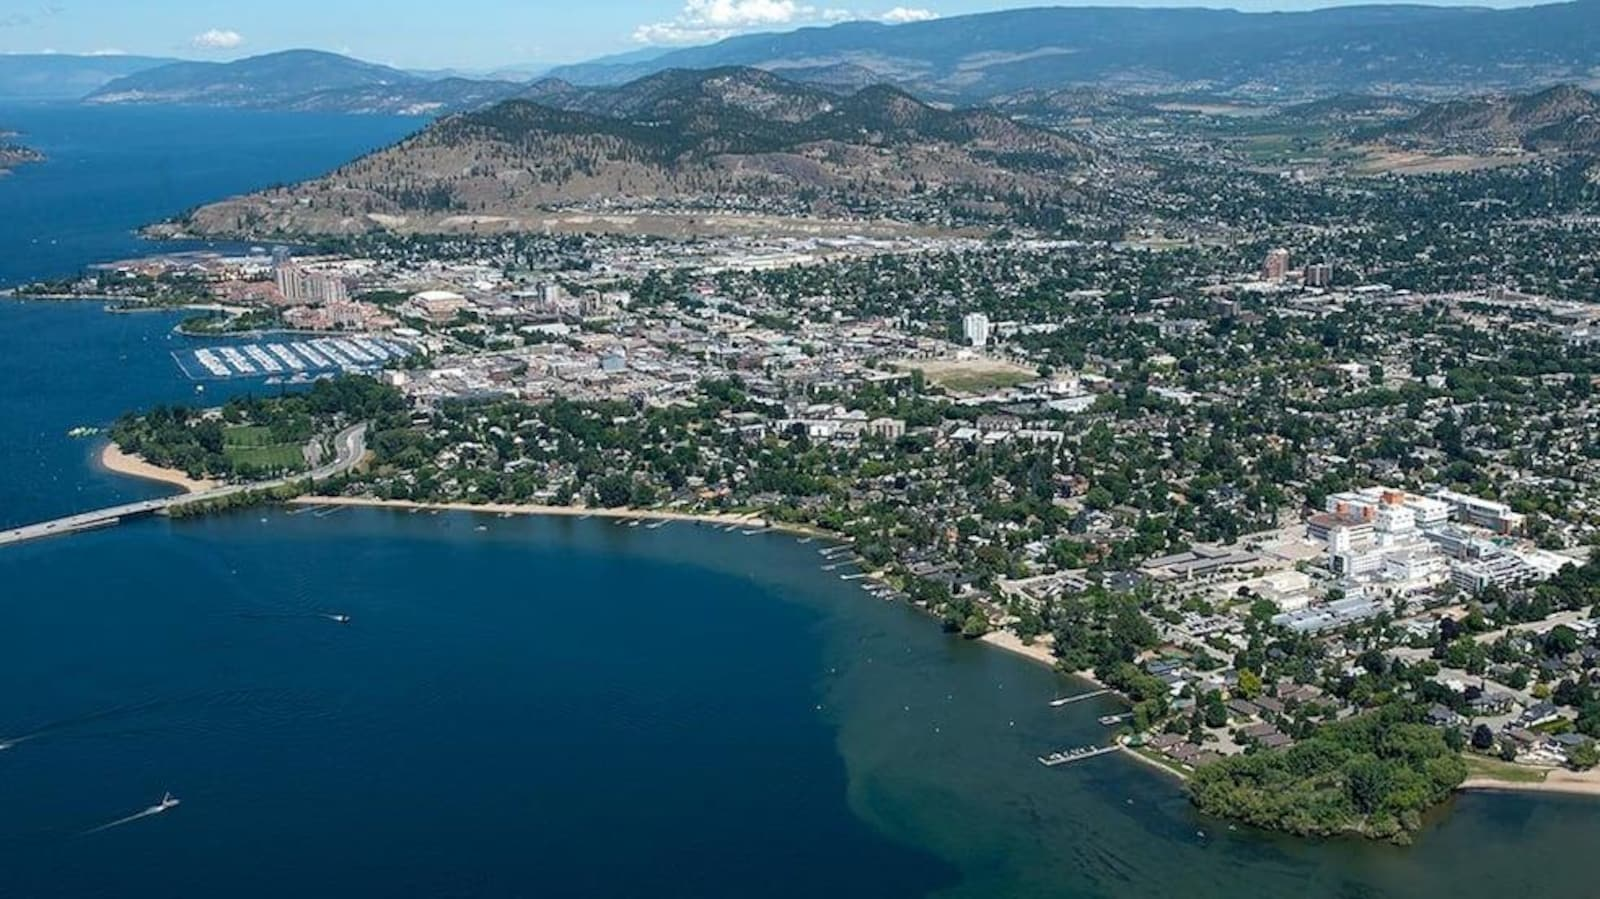 Vue aérienne de la ville de Kelowna, sur le bord du lac Okanagan.